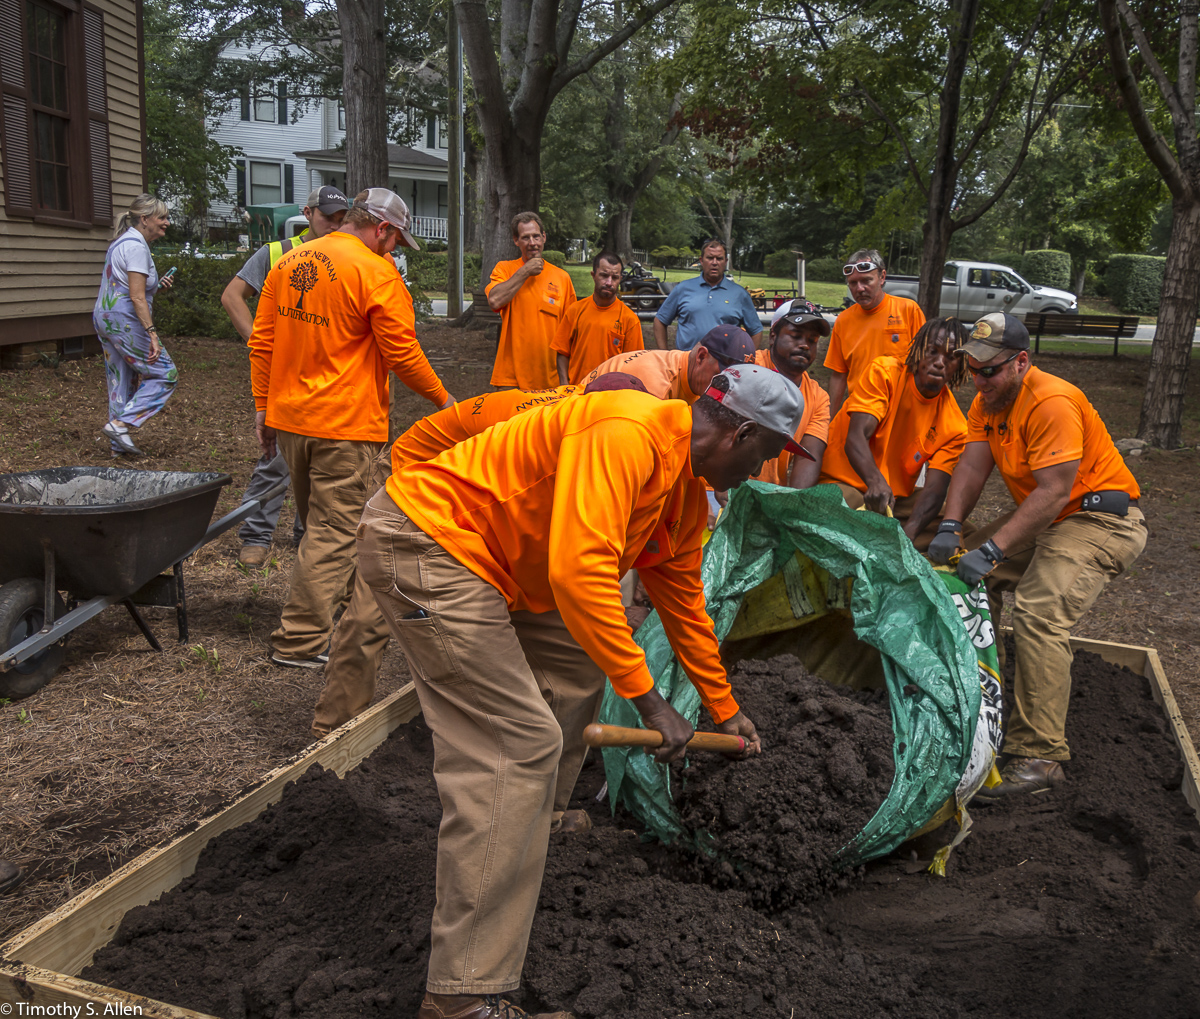 City of Newnan Crew Dump Dirt on the Site of Jane Ingram Allen's Newnan Art Rez Eco Art Quilt. It Is Located at Veterans Park Outside of the Men's Academy School Newnan, GA, U.S.A. August 25, 2017